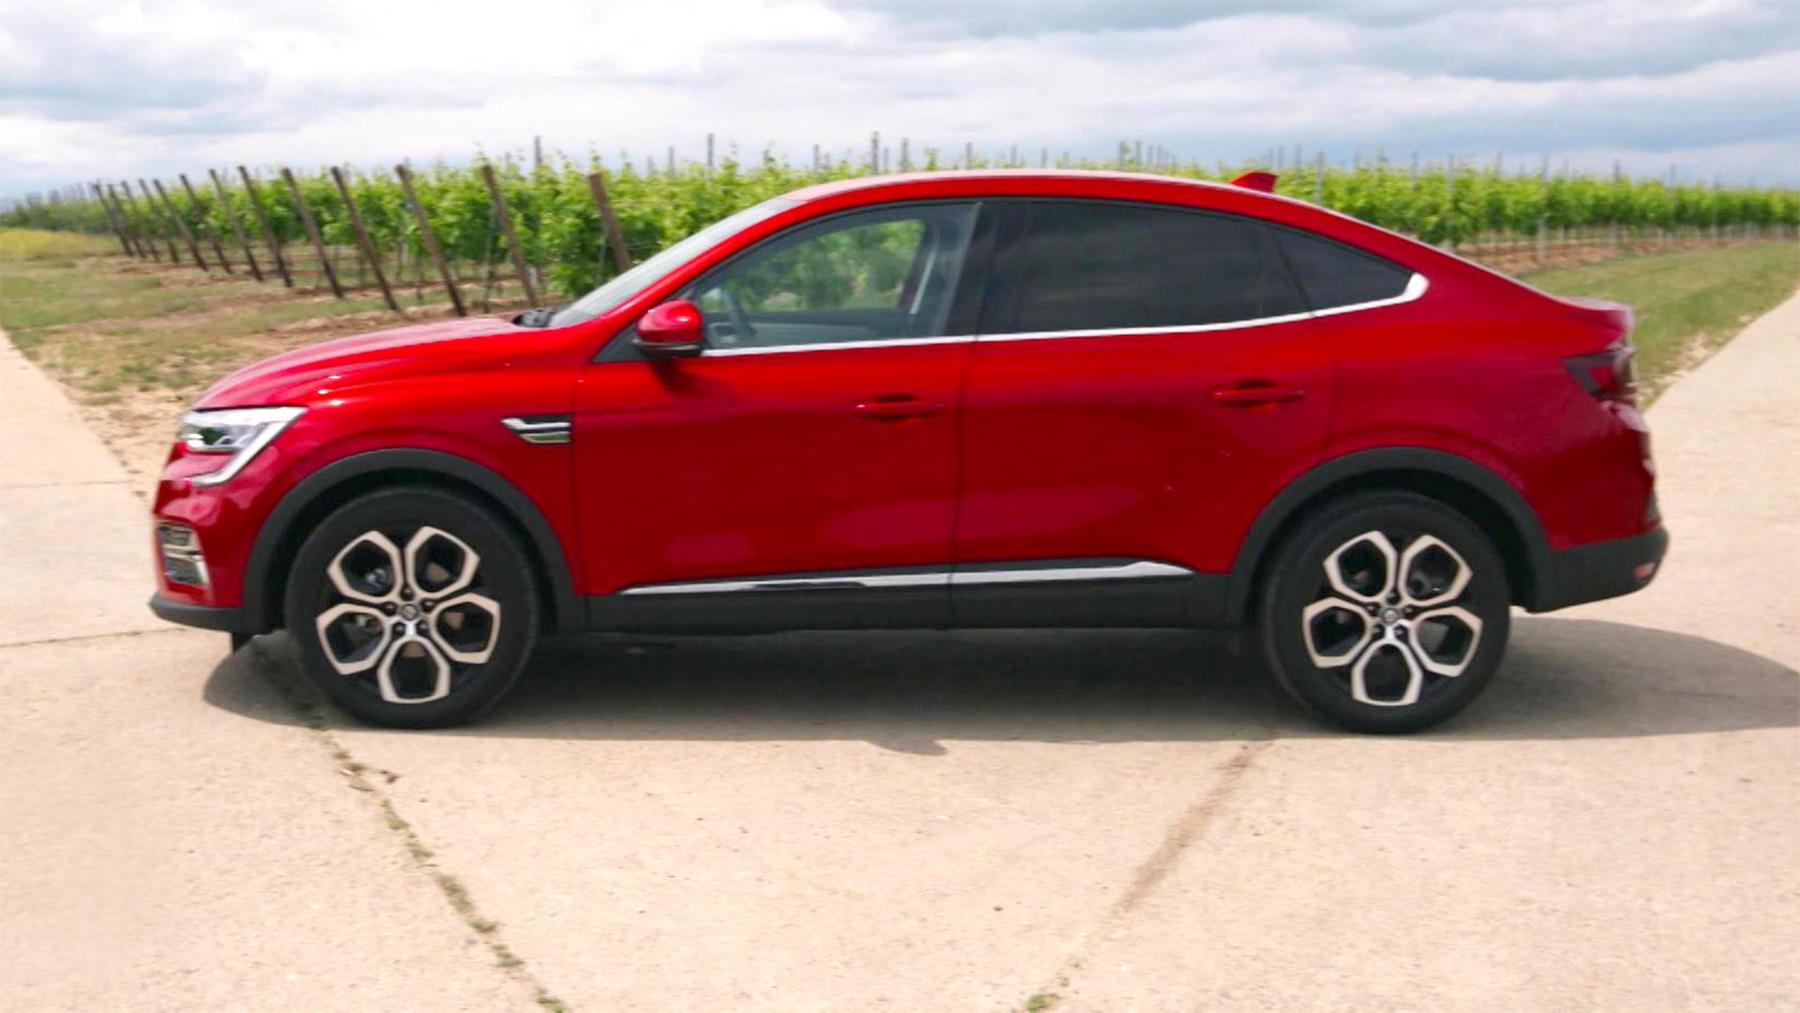 Heute u.a.: Der Renault Arkana